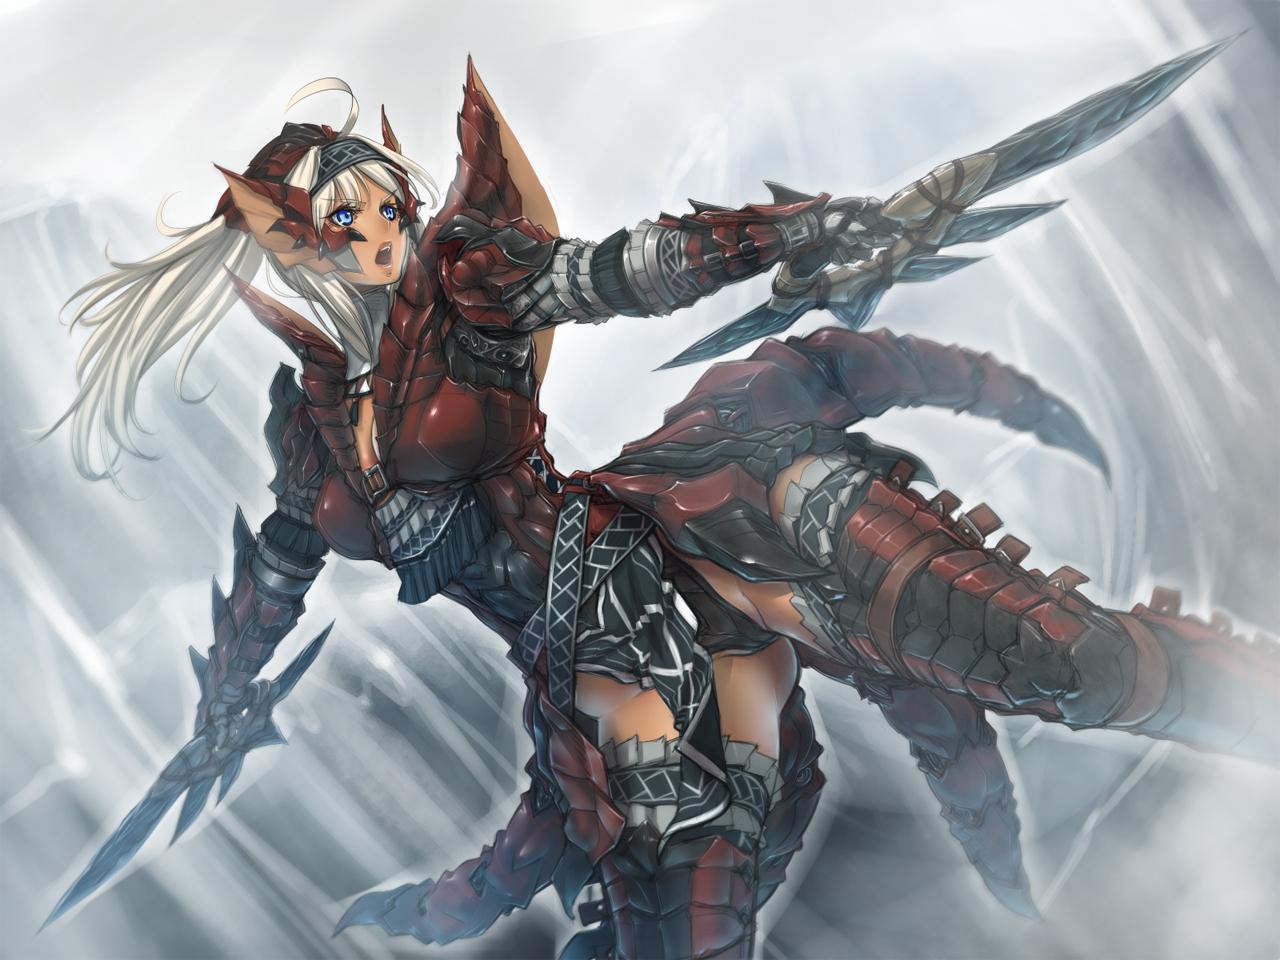 Rathalos Armor Monster Hunter Series Image 480011